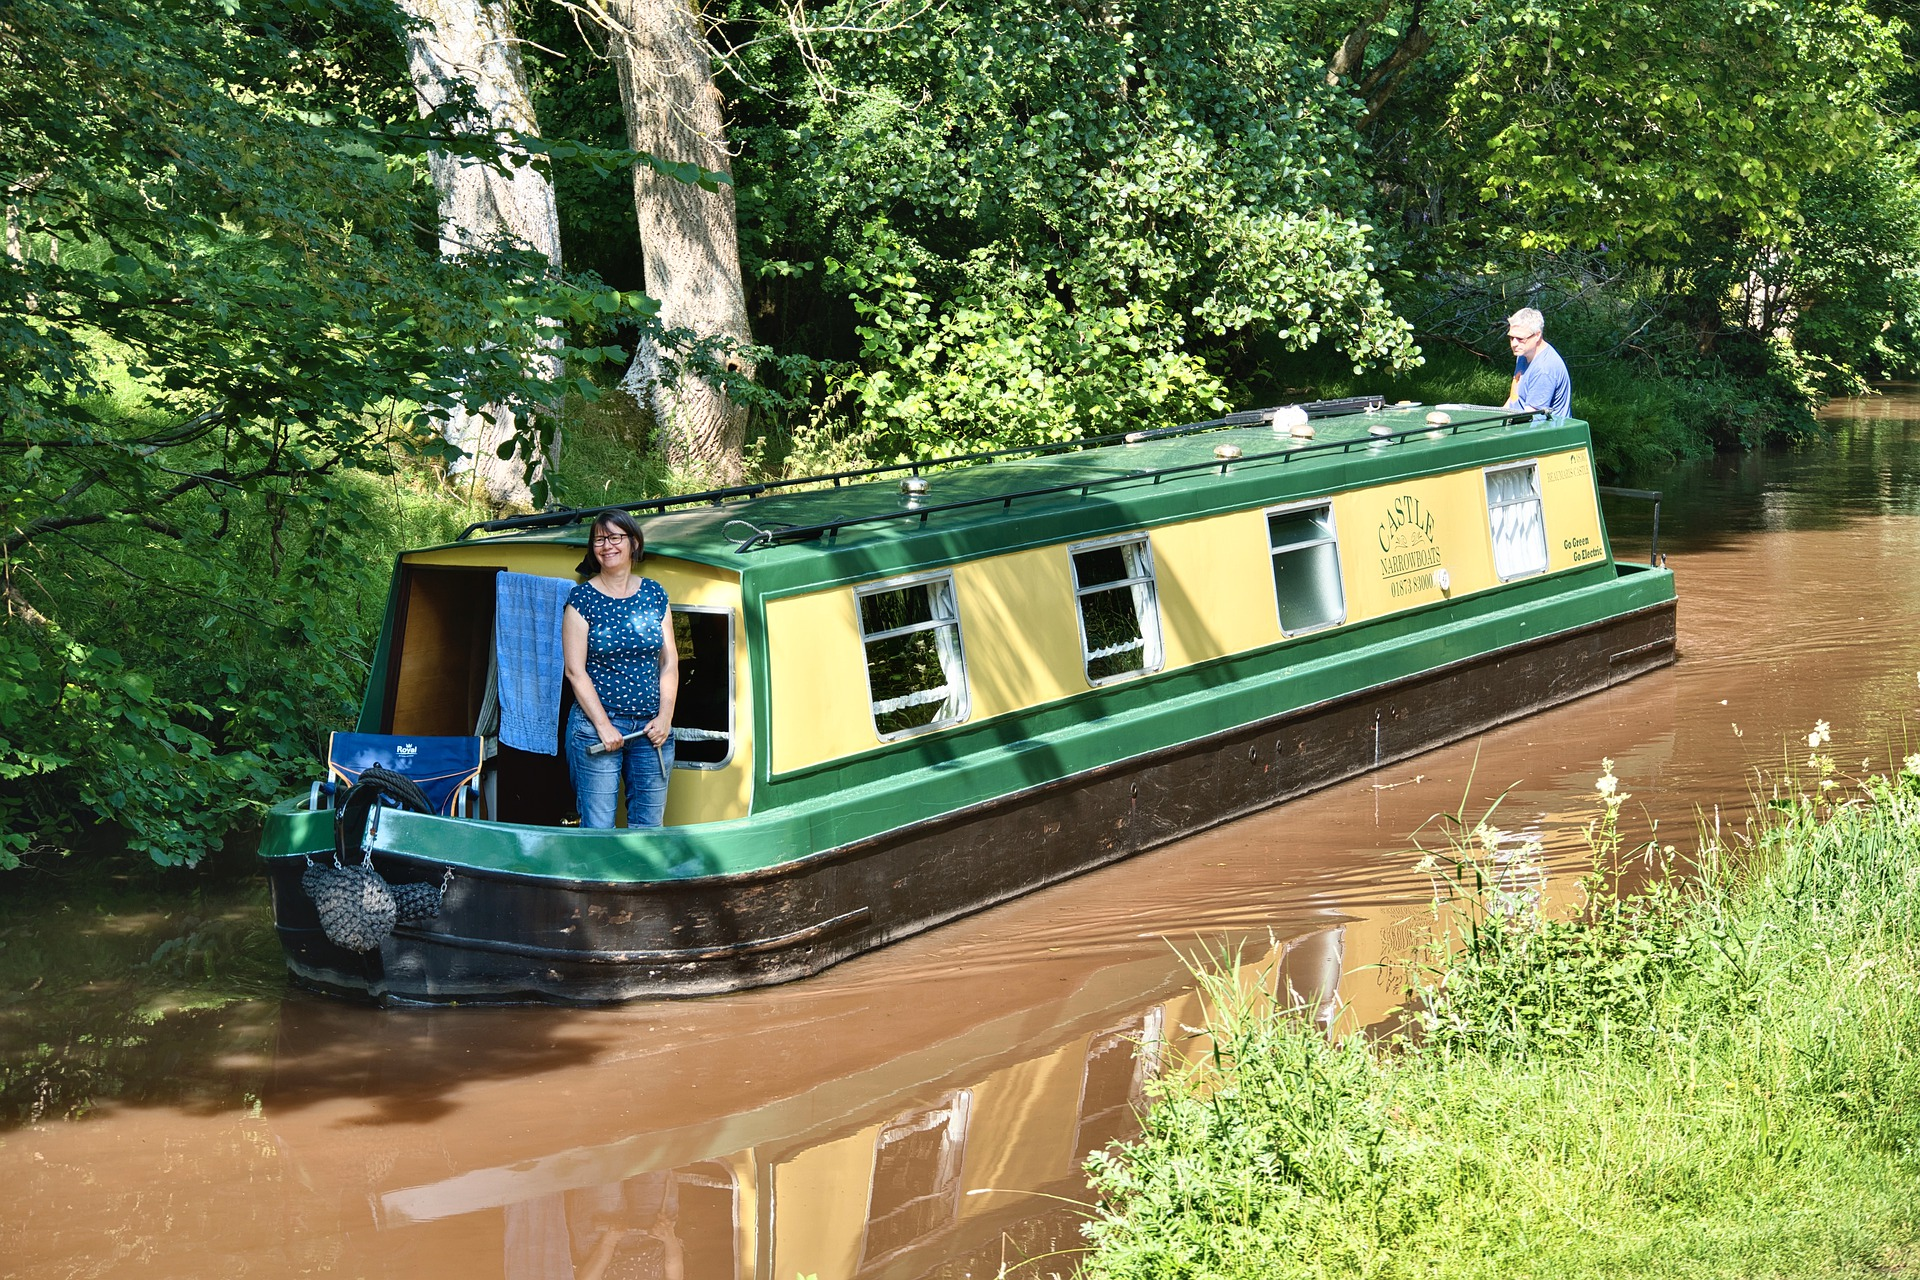 houseboat-6584721_1920.jpg